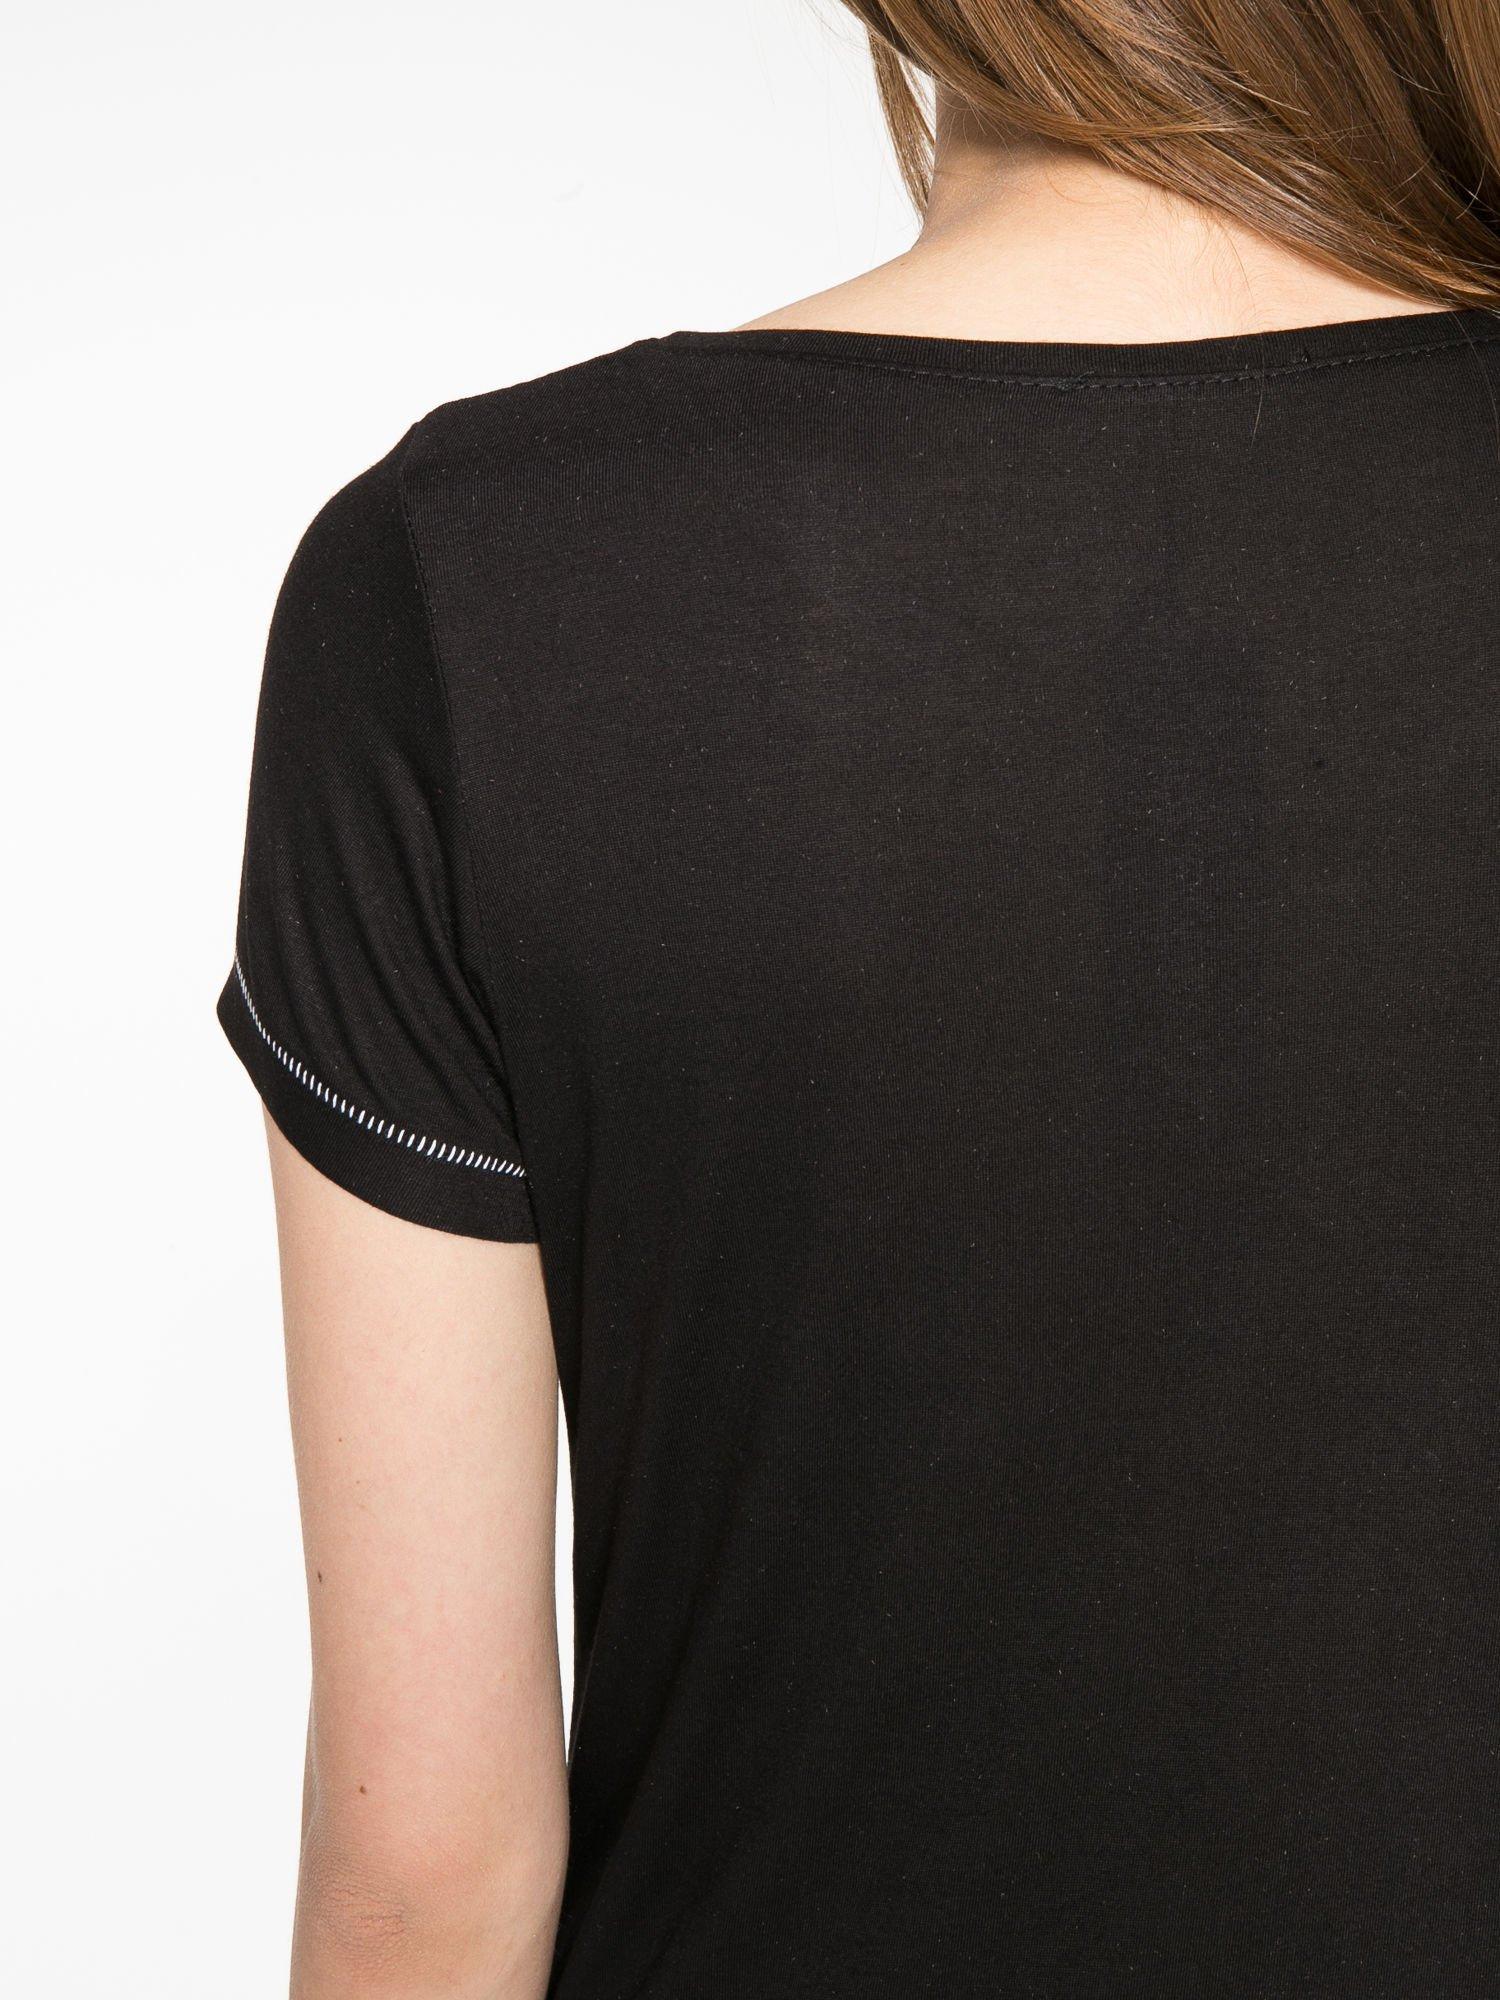 Czarny t-shirt z napisem EVERY WOMAN IS A REBEL                                  zdj.                                  11